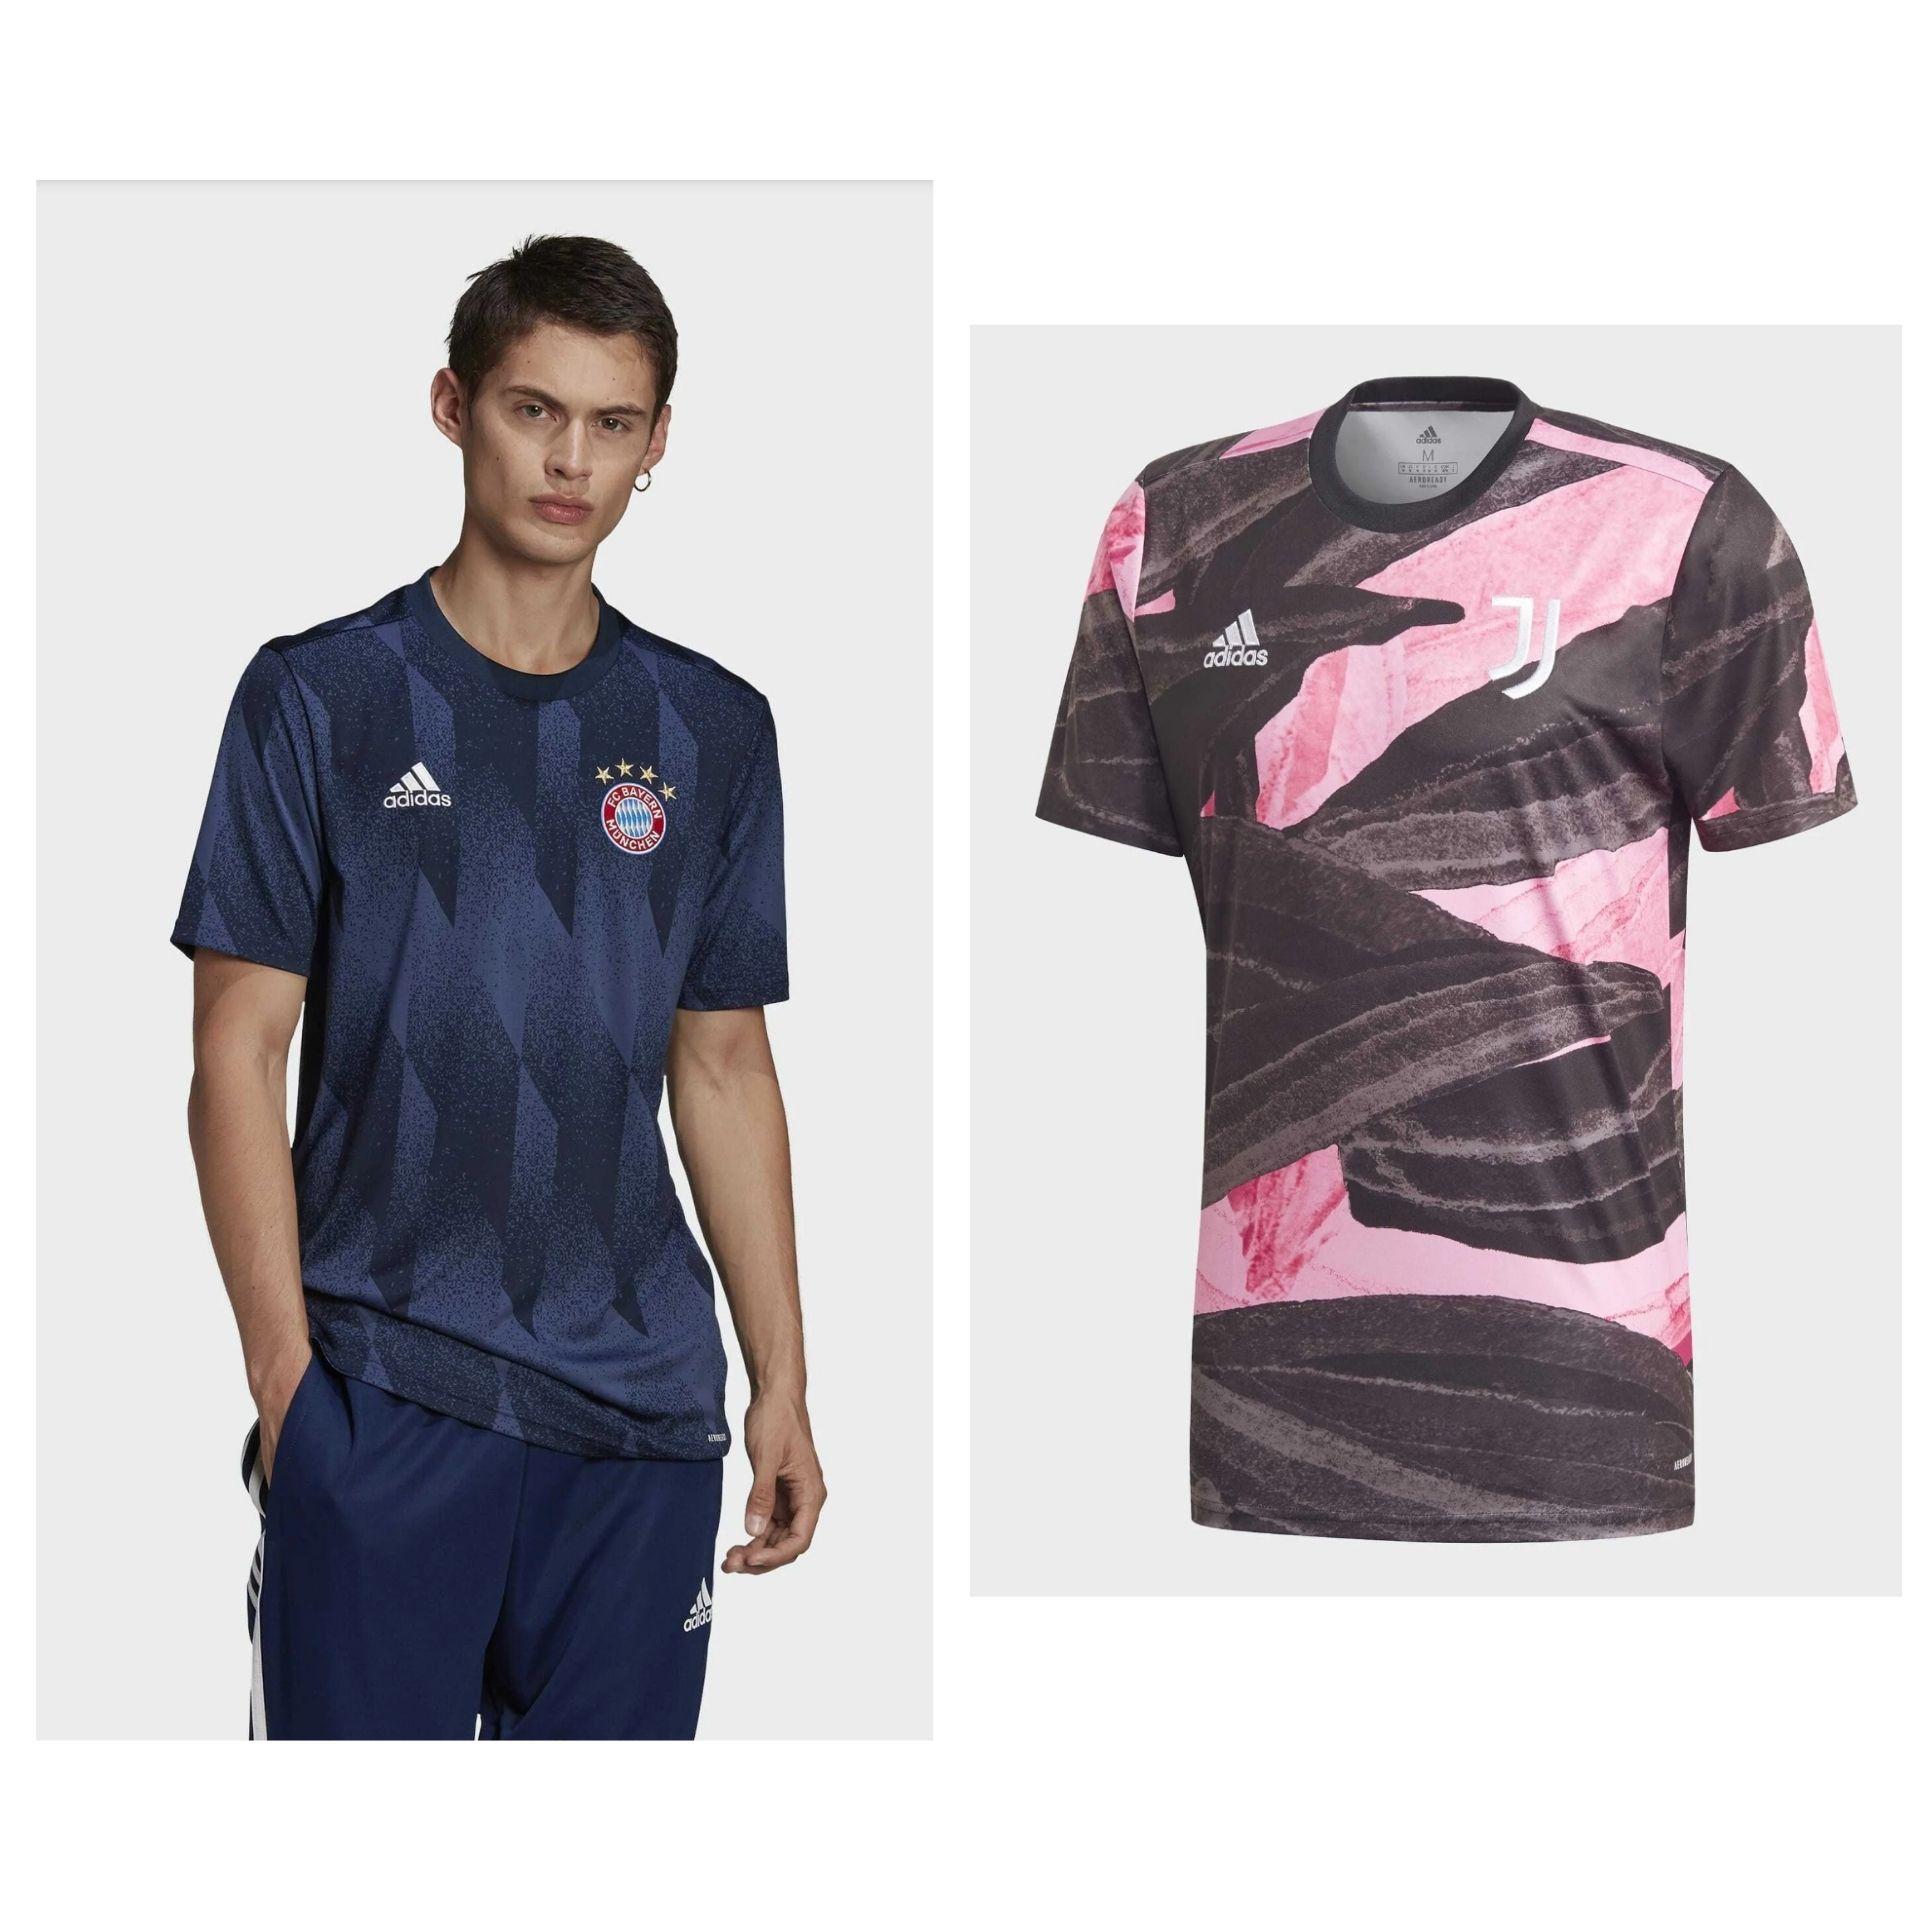 Camisetas Calentamiento Bayern de Múnich o Juventus 20/21